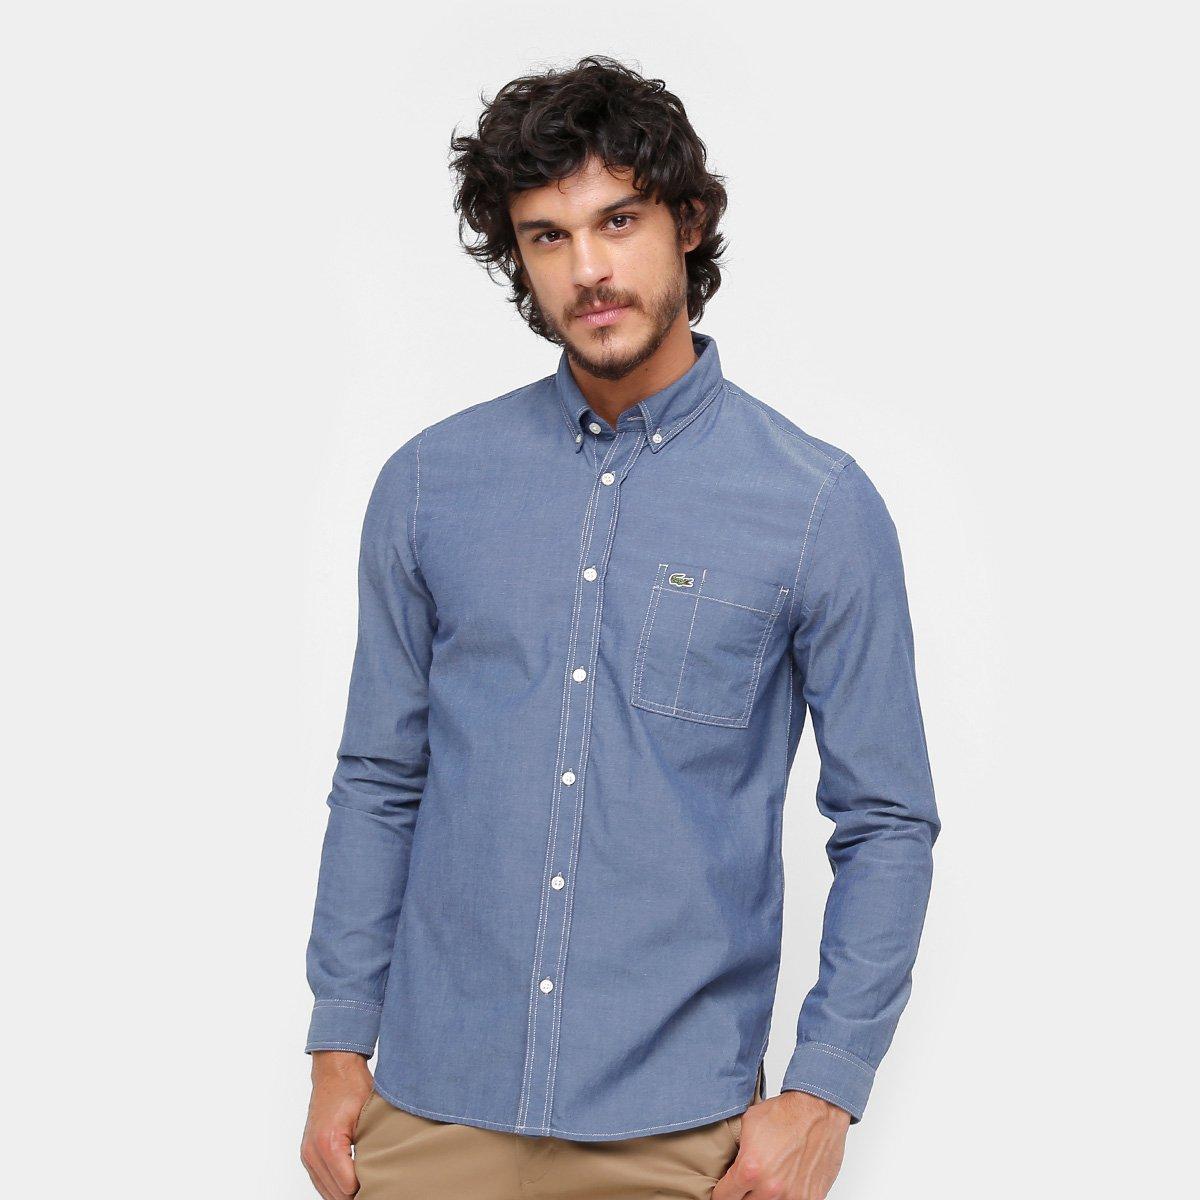 c3a4befa3cf0d Camisa Jeans Lacoste Regular Fit Com Bolso Masculina - Compre Agora ...